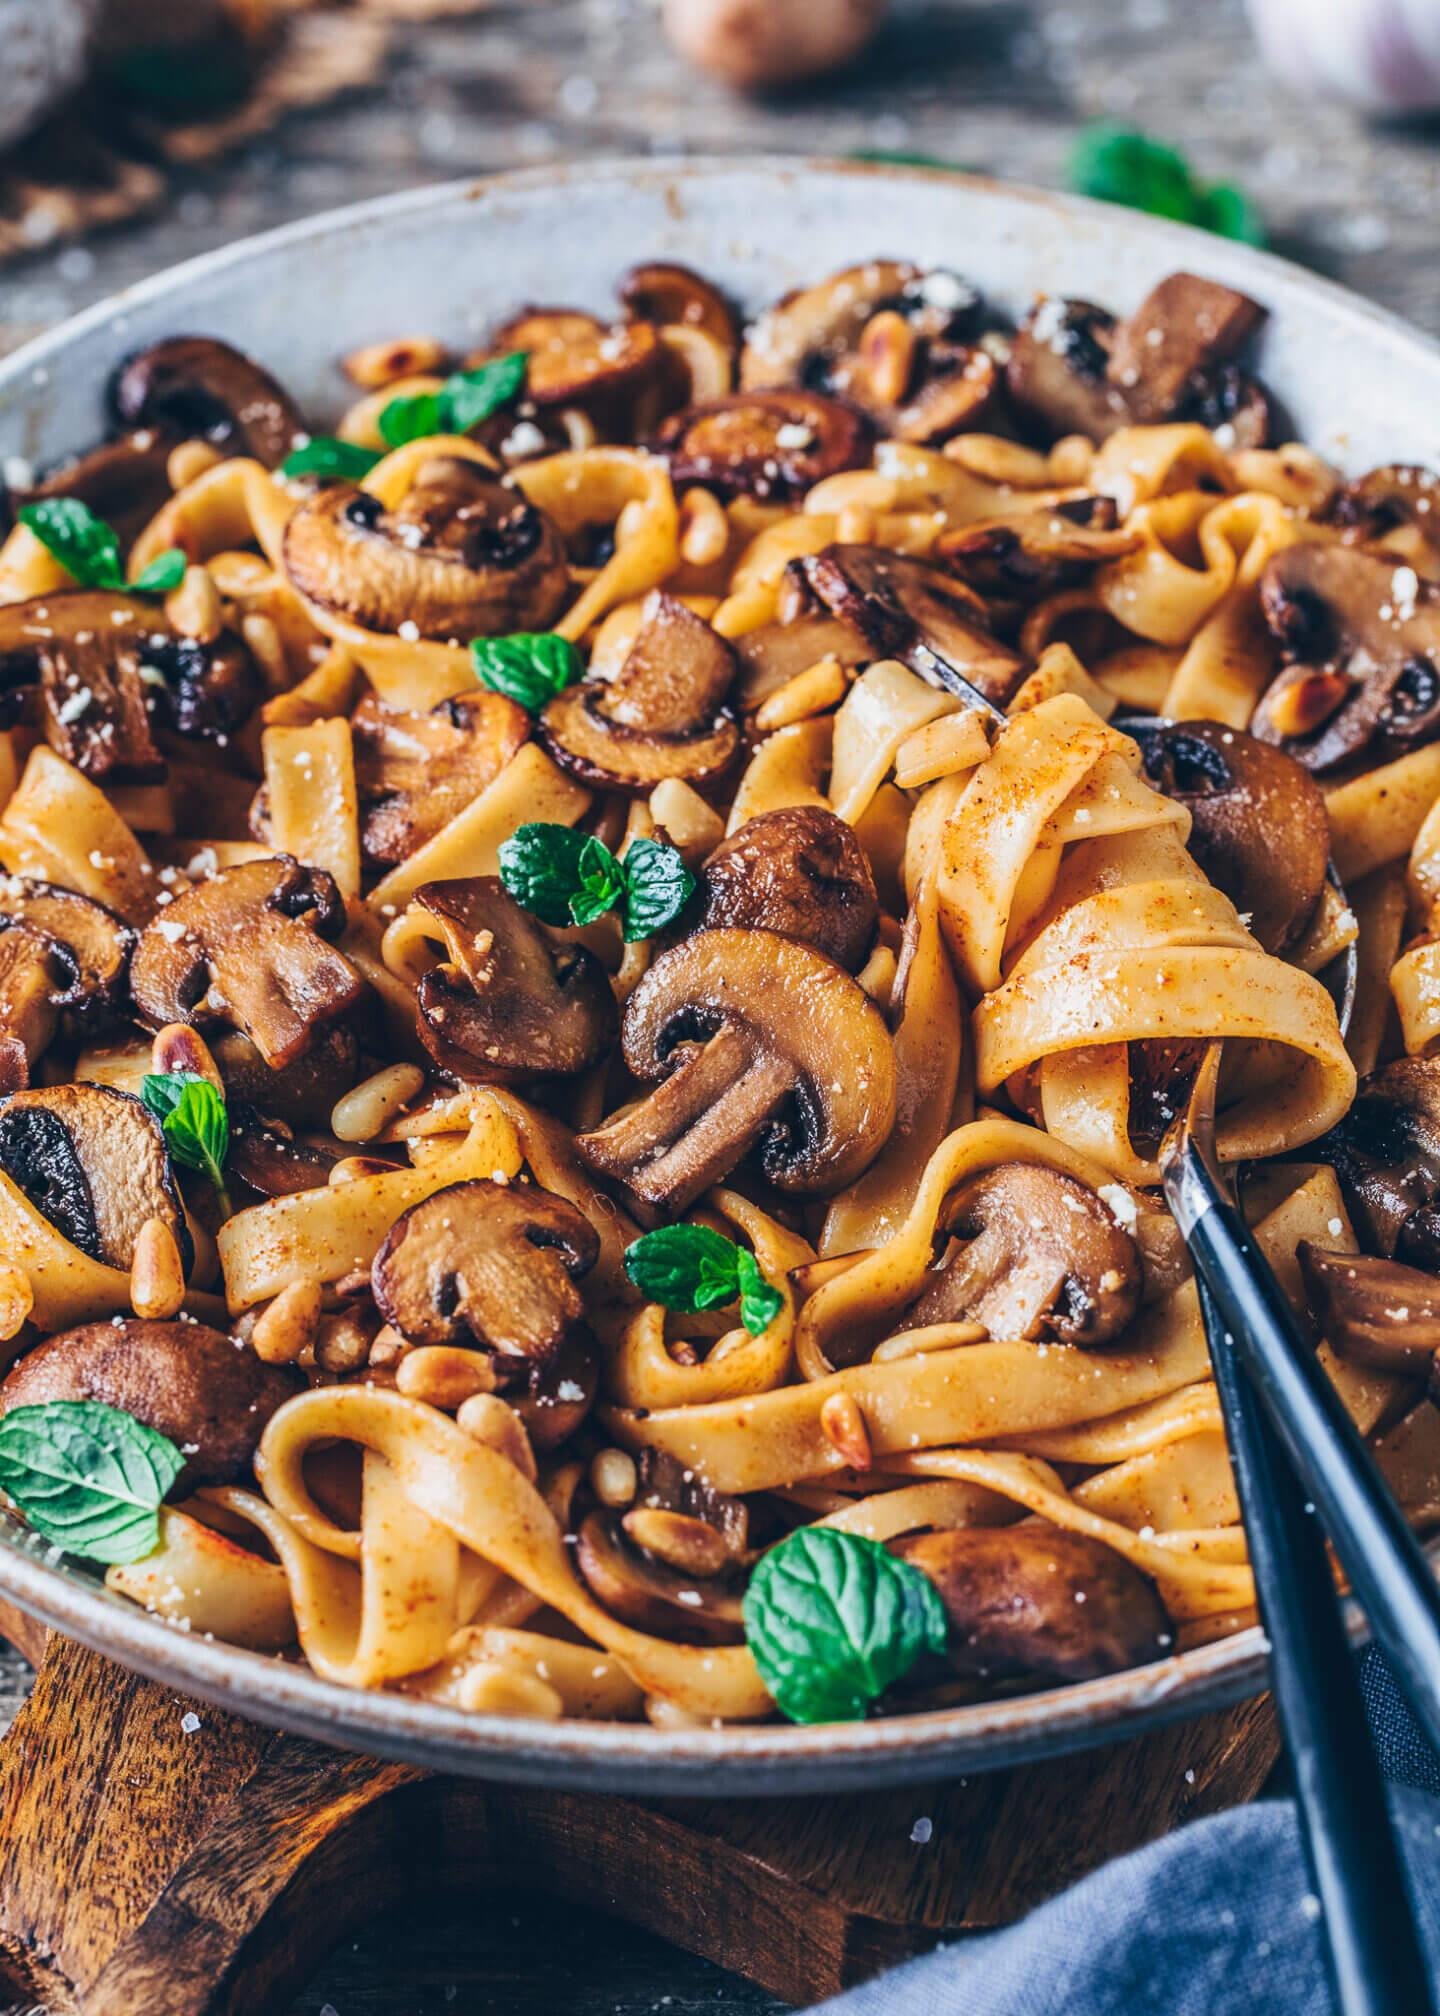 Caramelized Balsamic Mushroom Pasta